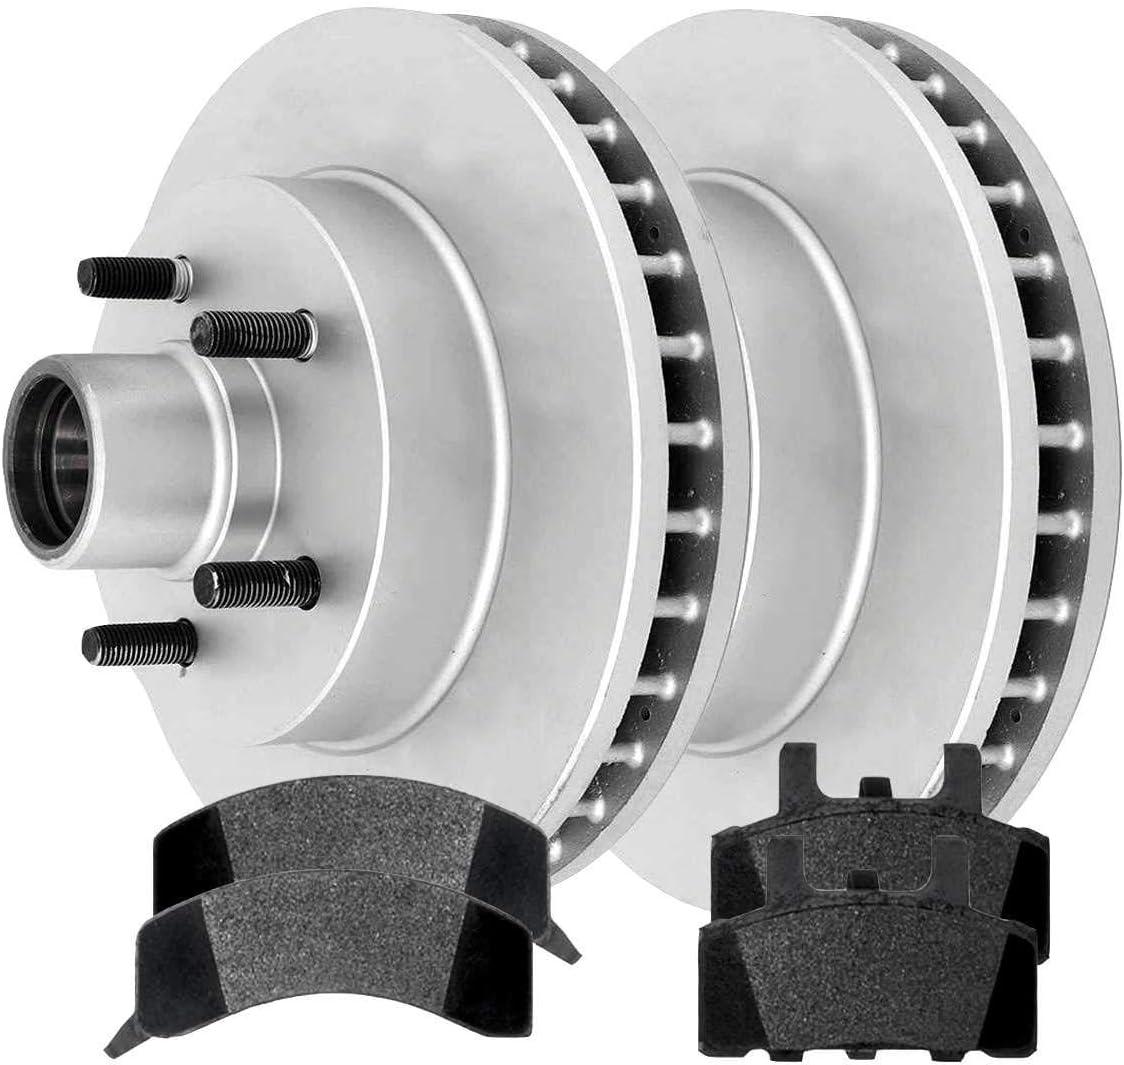 Auto Shack RSCD6597-6597-369-2-4 Front Ceramic Brake Pad and Rotor Bundle